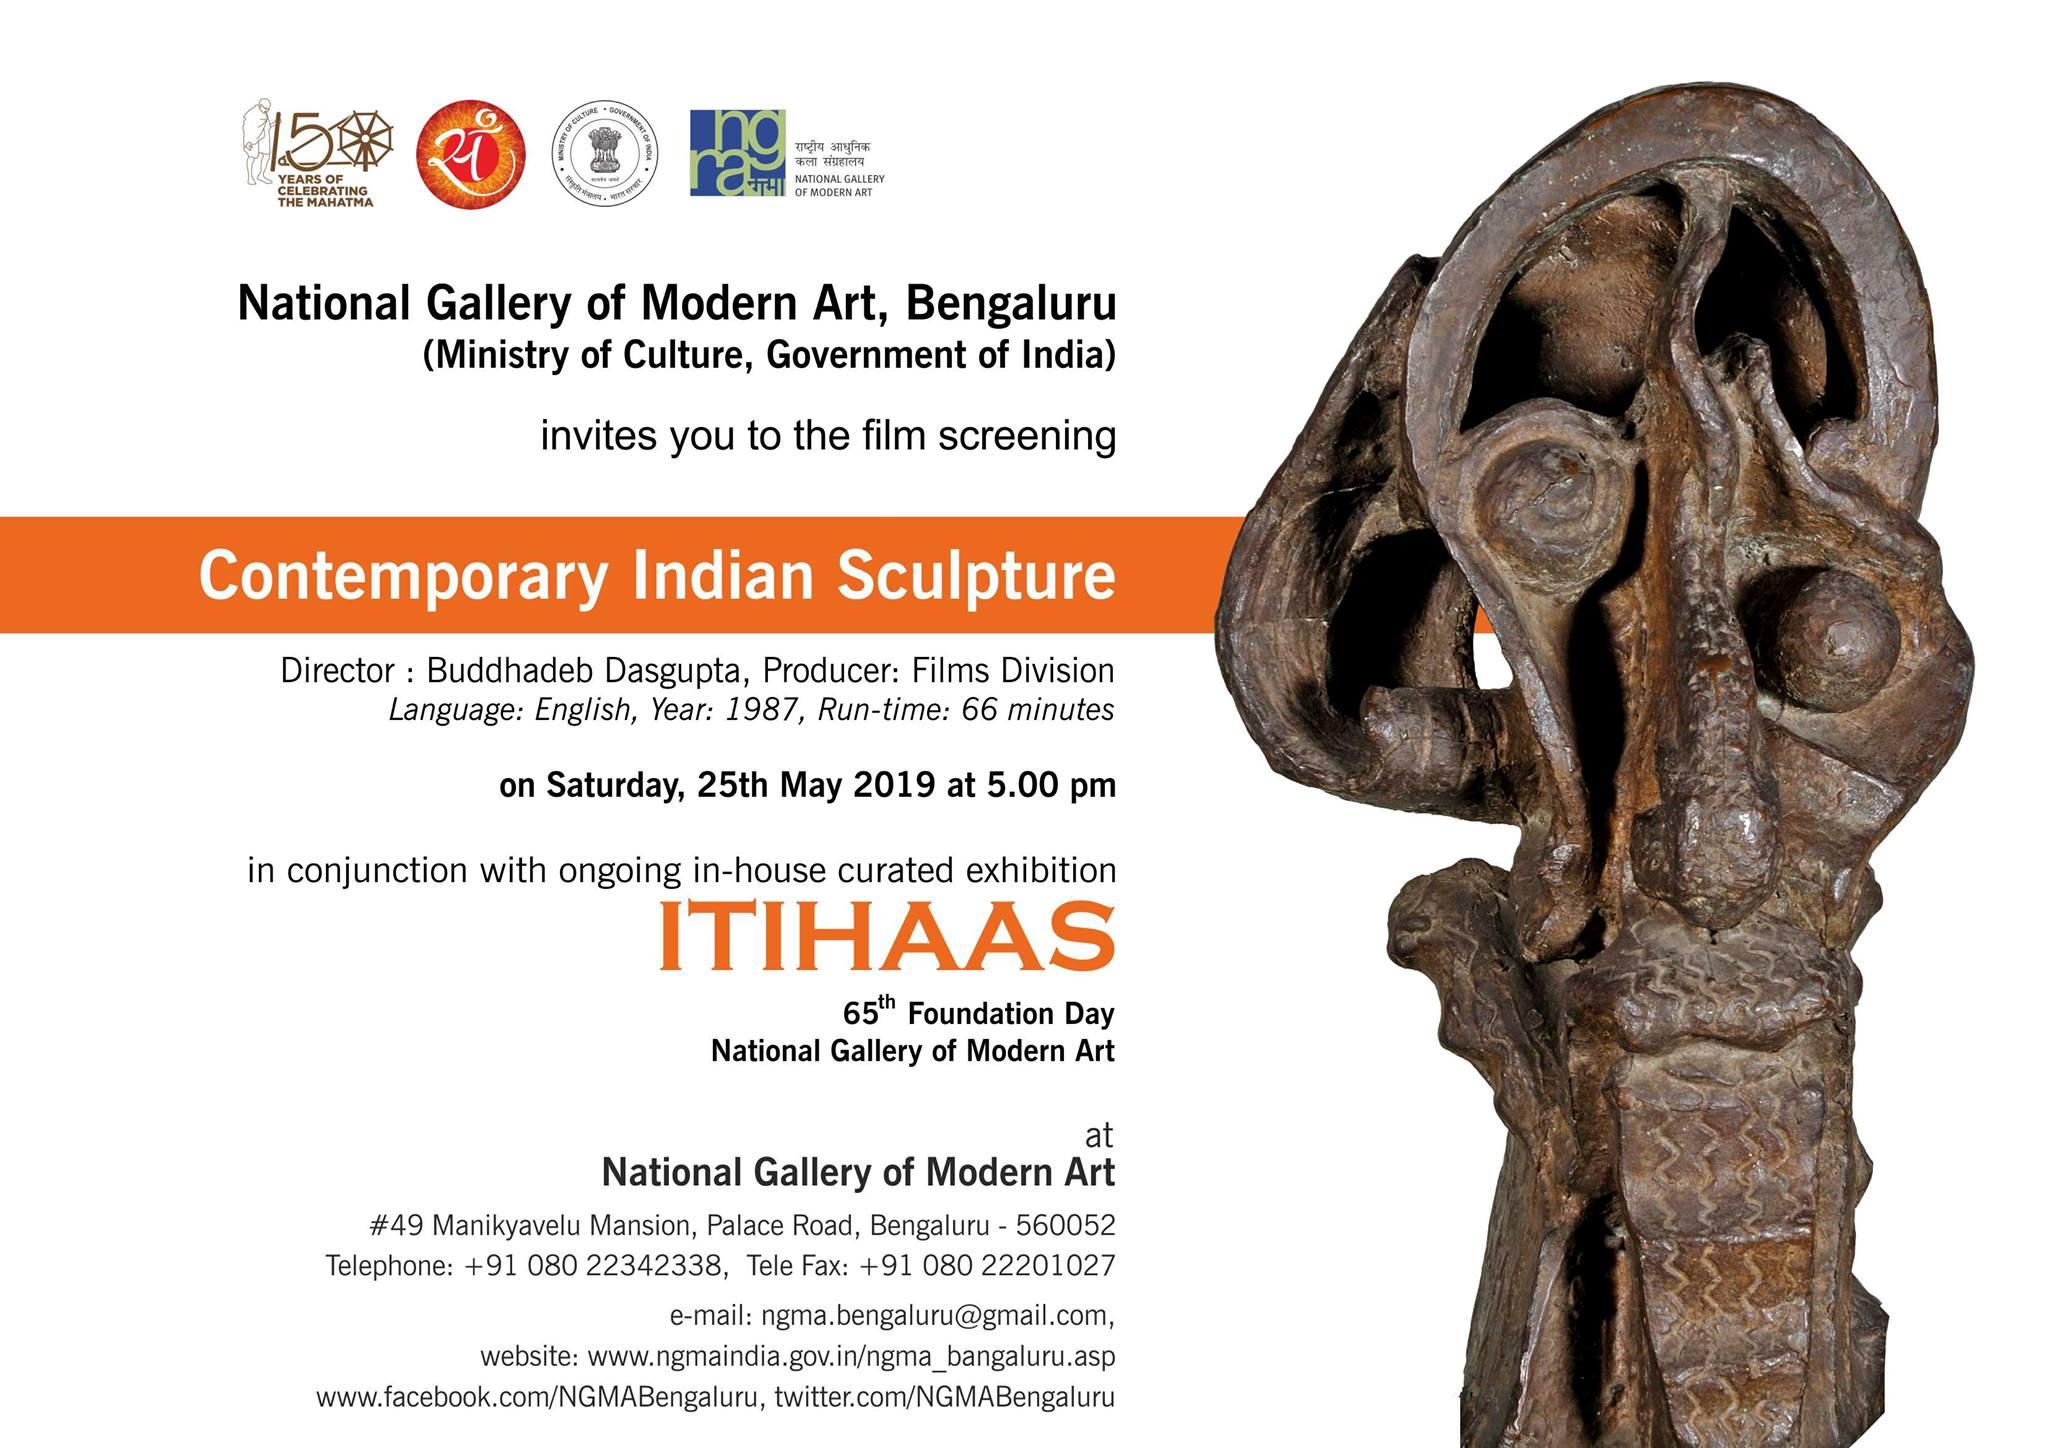 Contemporary Indian Sculpture